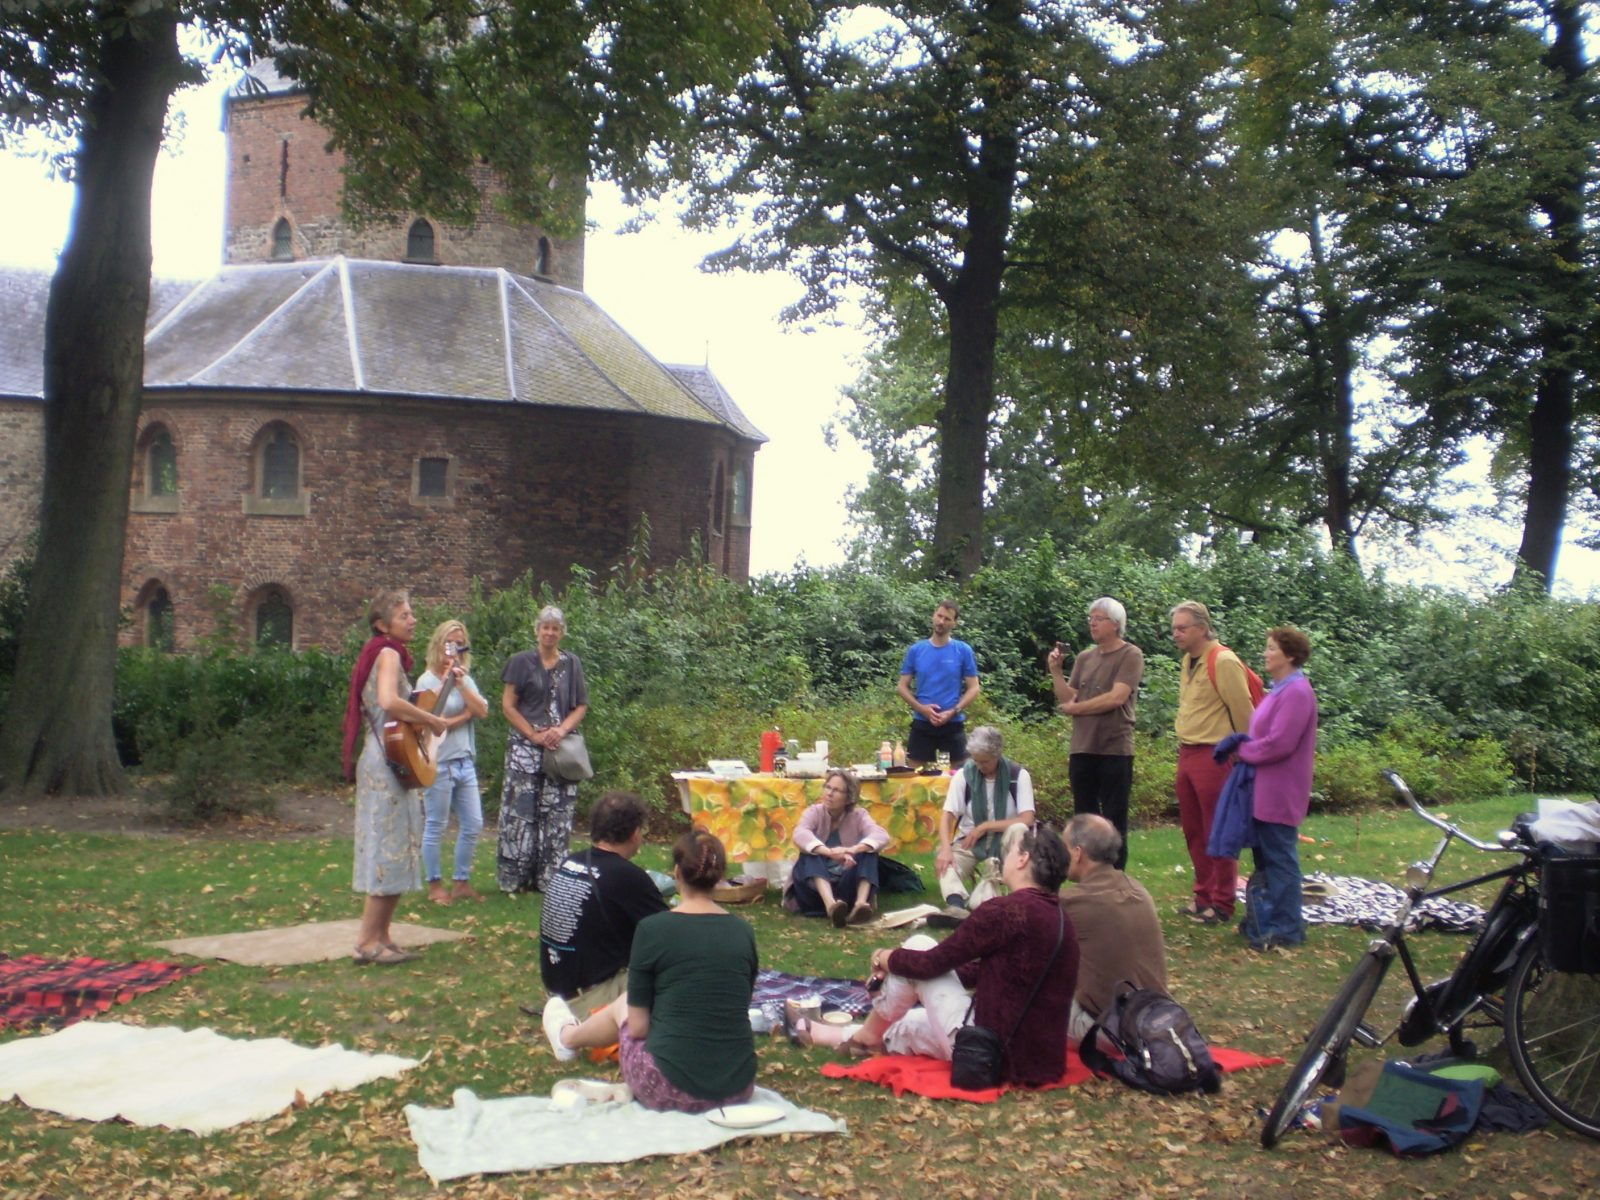 Geslaagde picknick